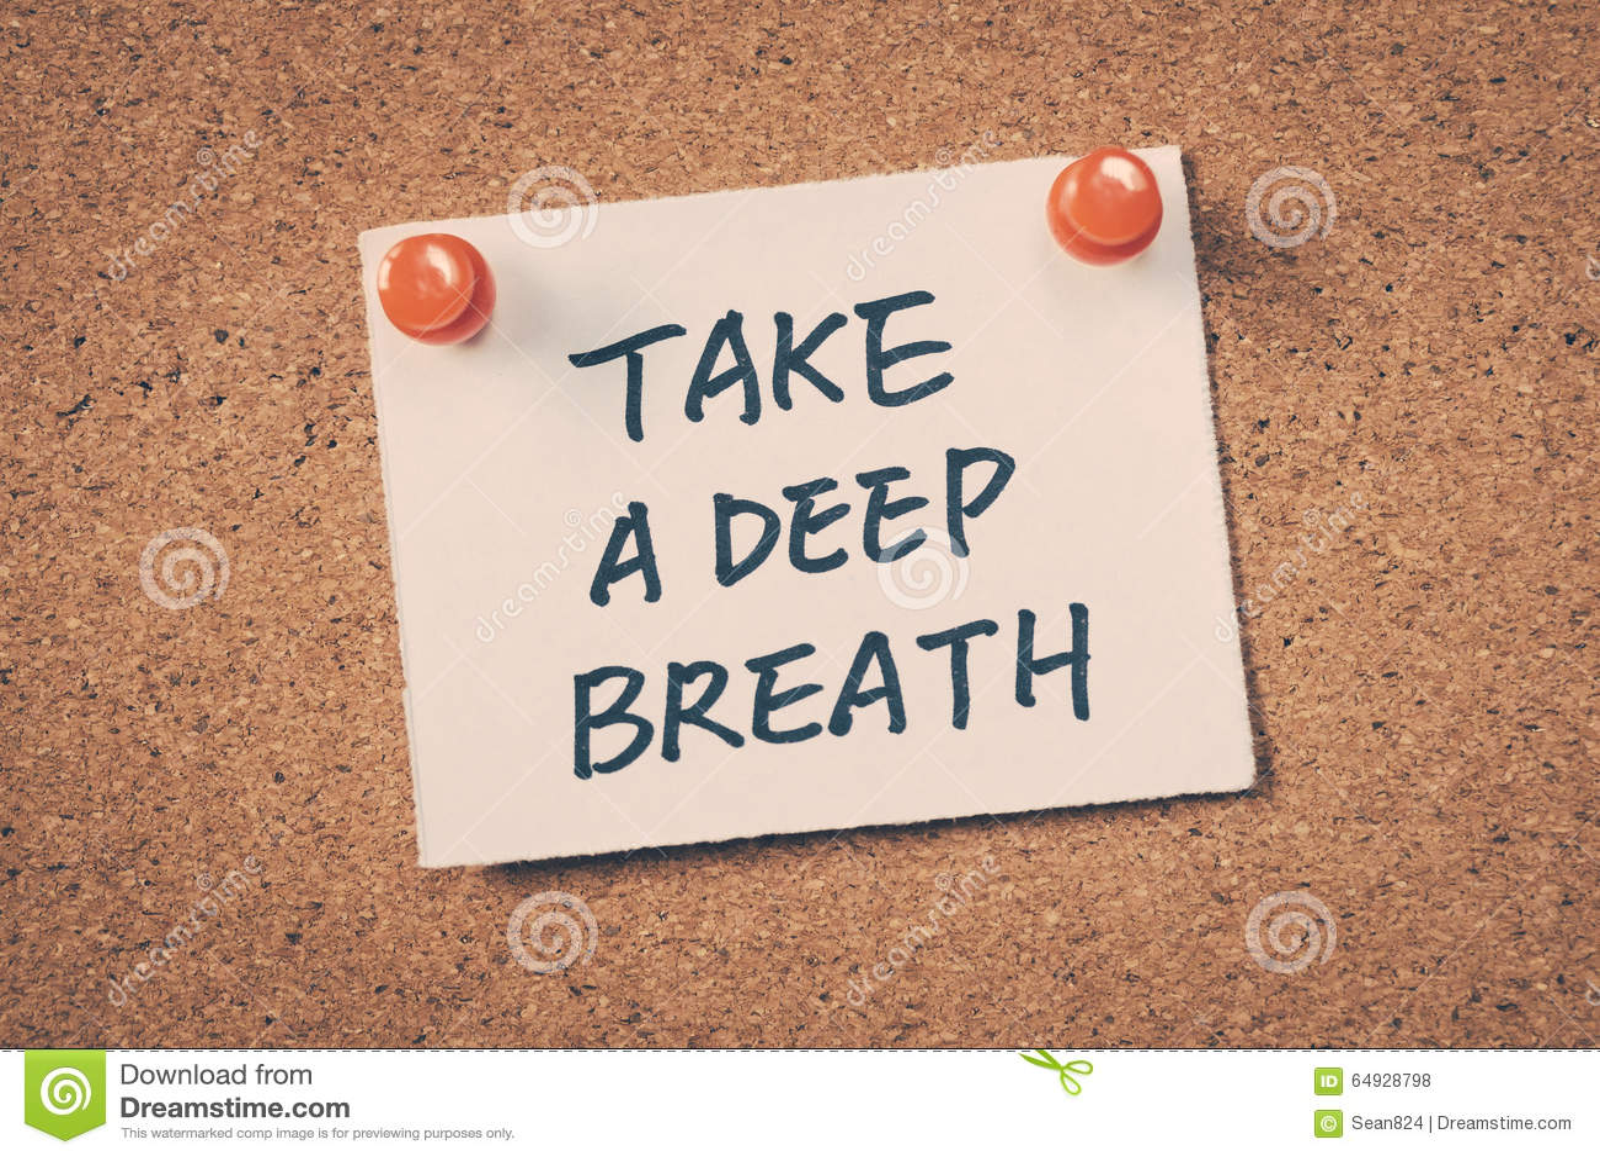 Take A Deep Breath Stock Photo - Image: 64928798